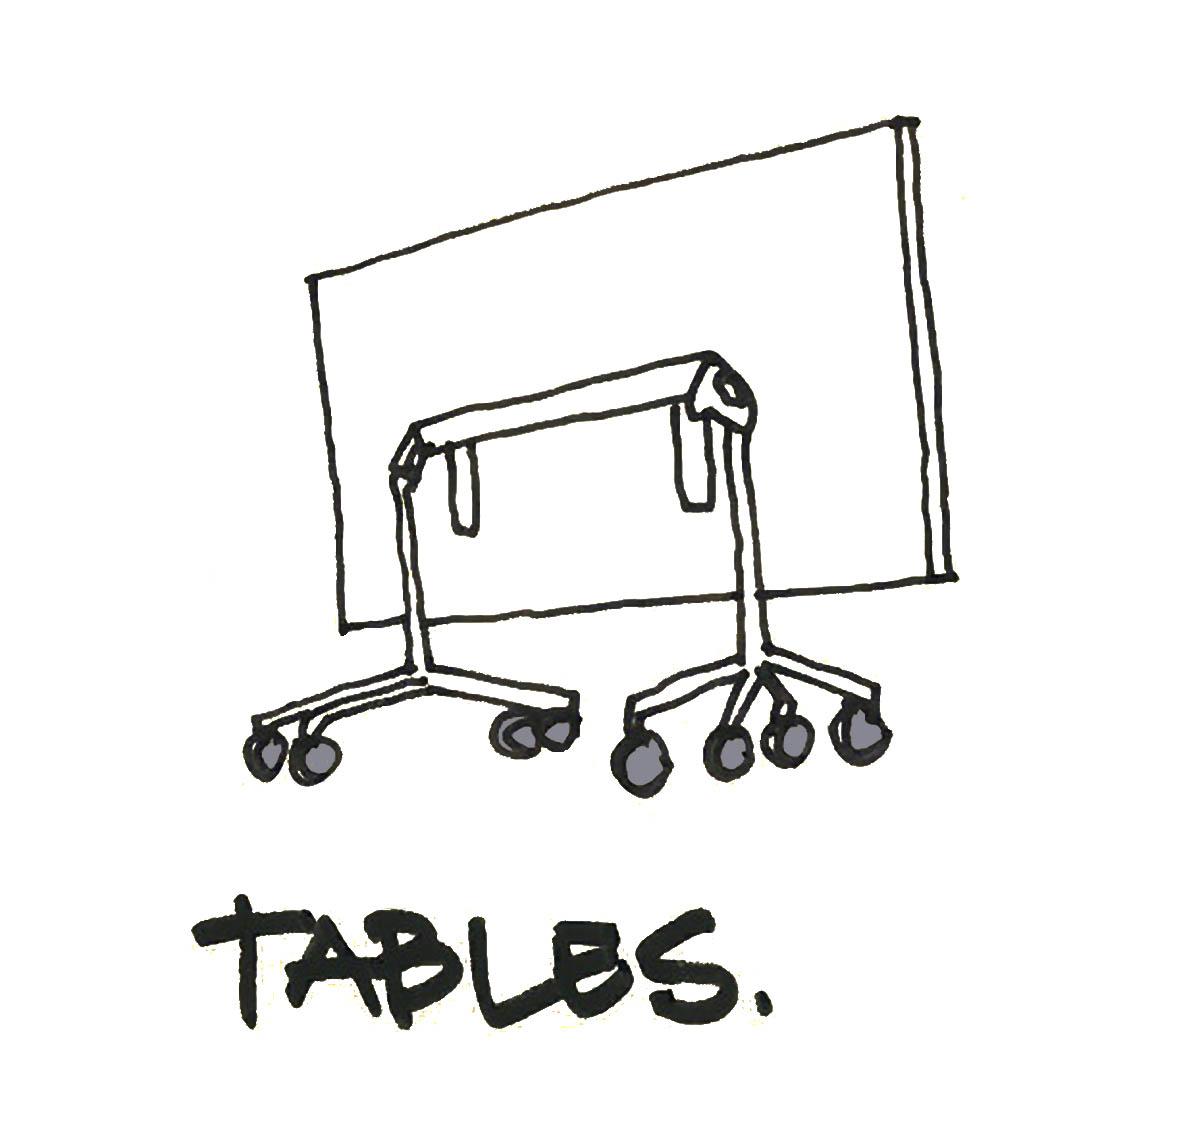 Tables -website 171212.jpg